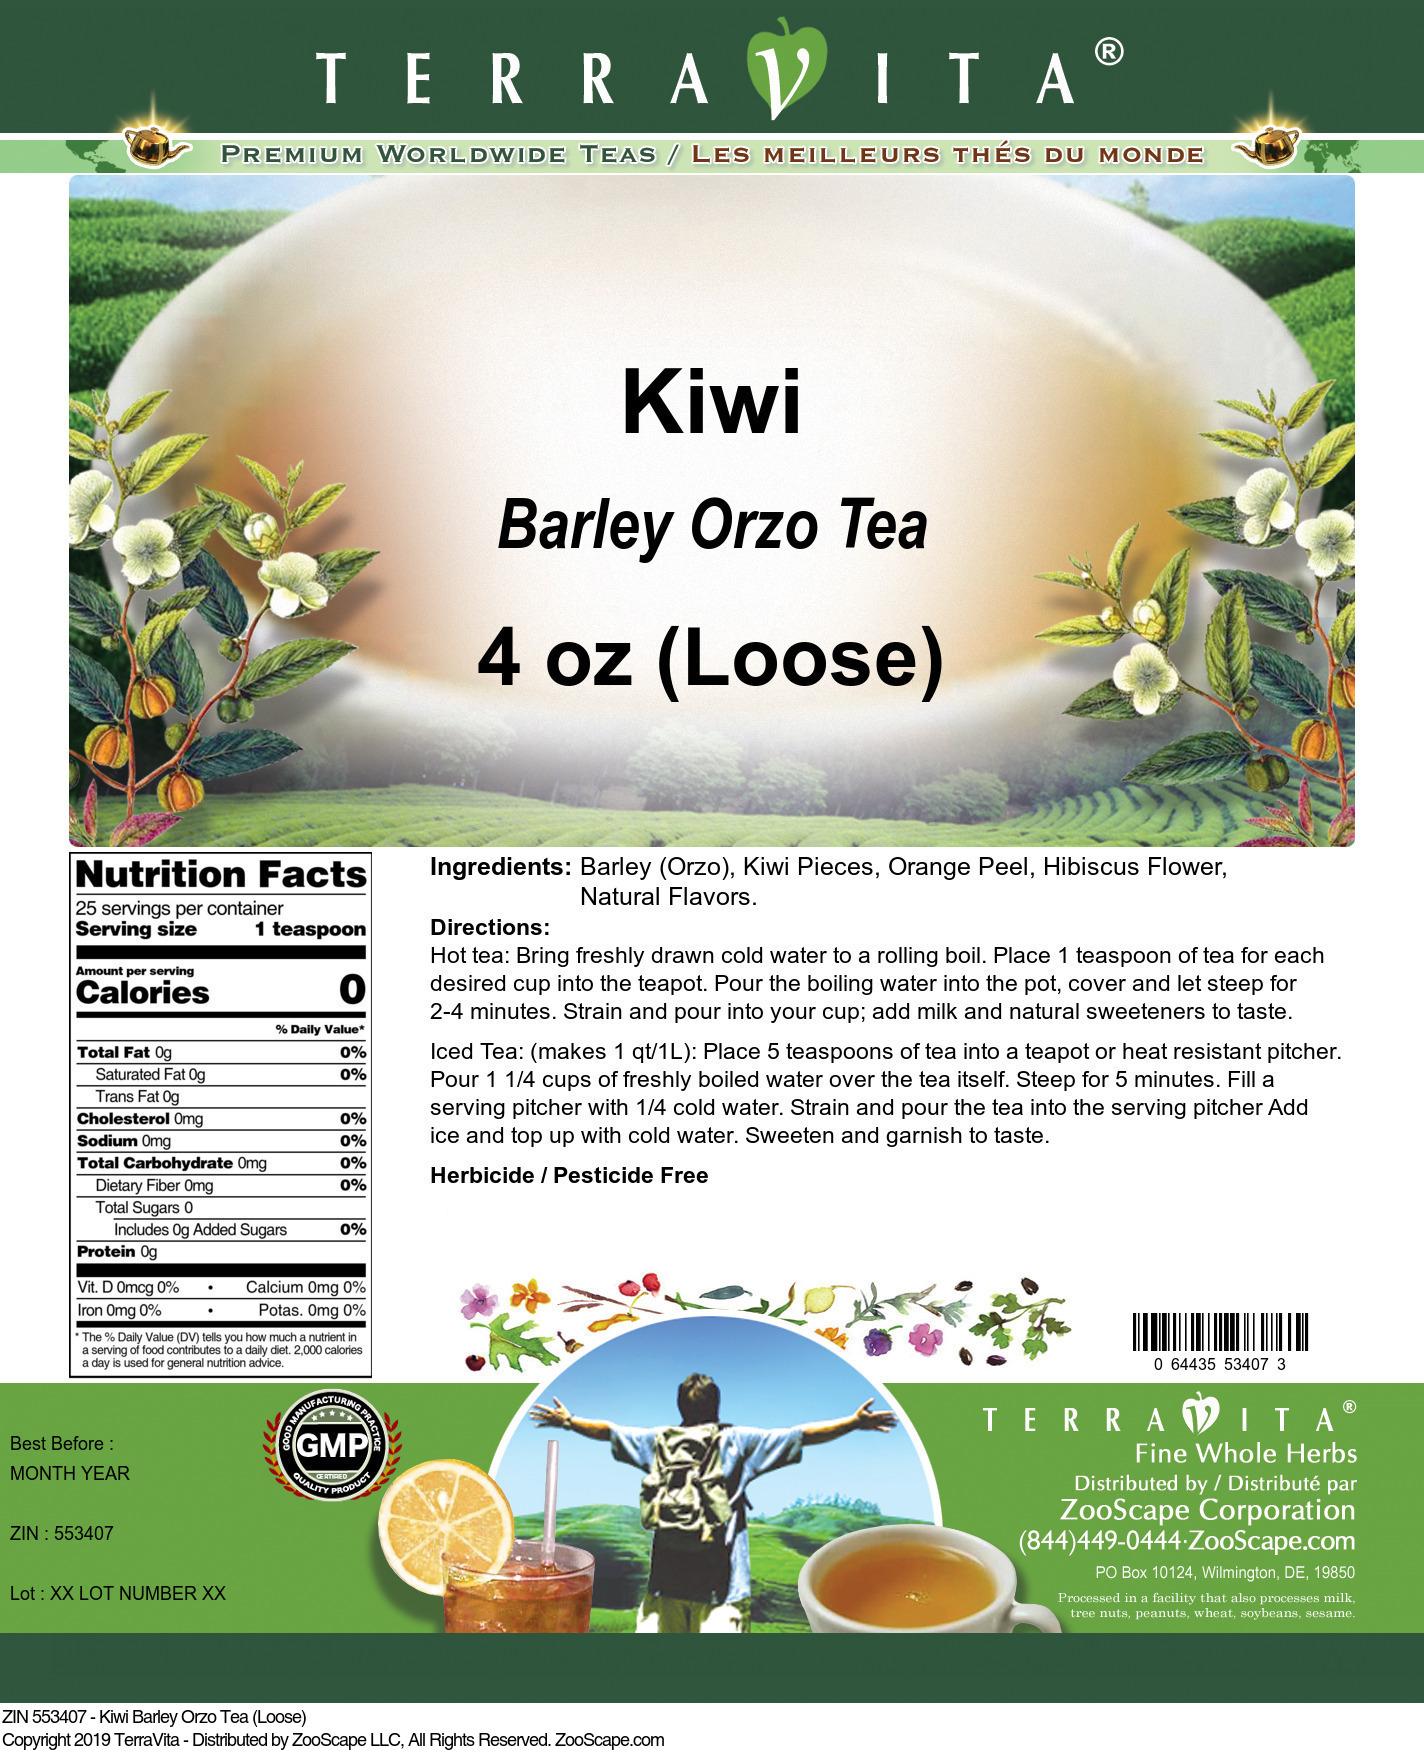 Kiwi Barley Orzo